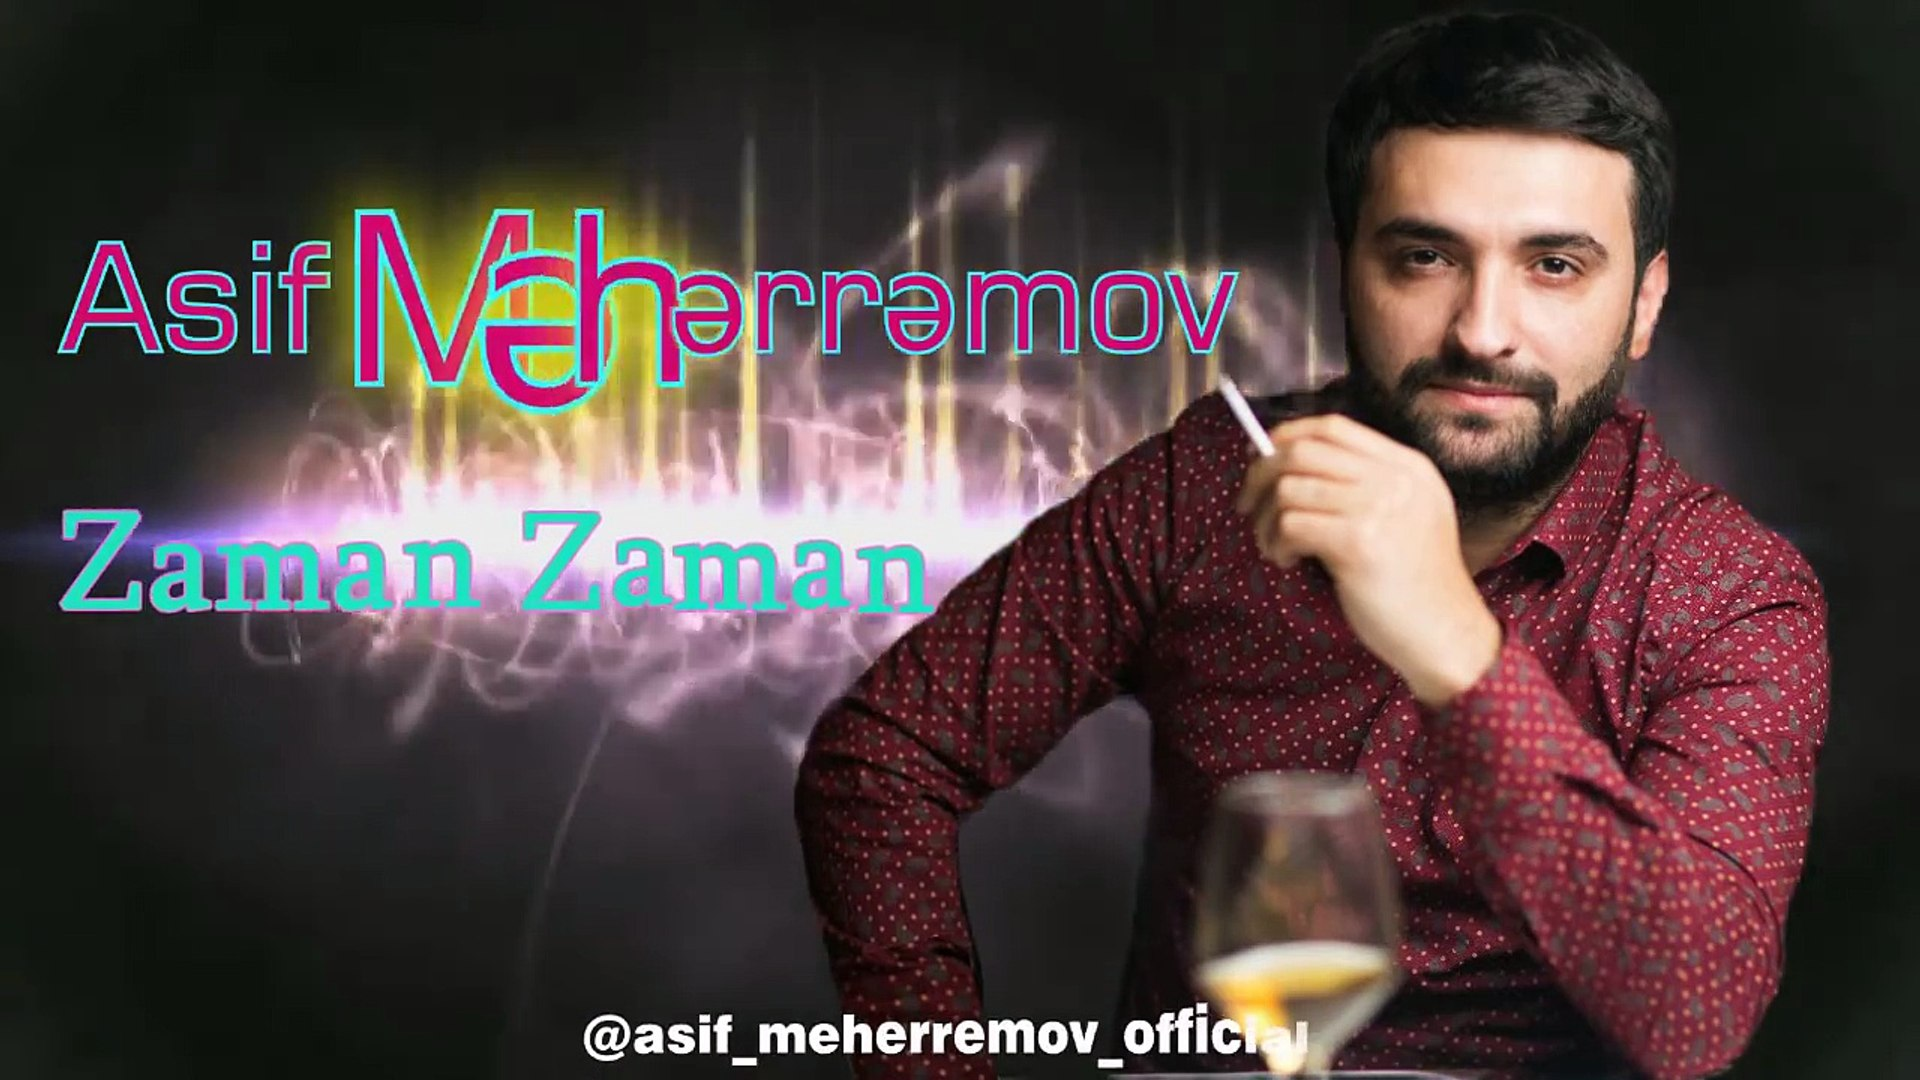 Asif Meherremov Zaman Zaman Video Dailymotion